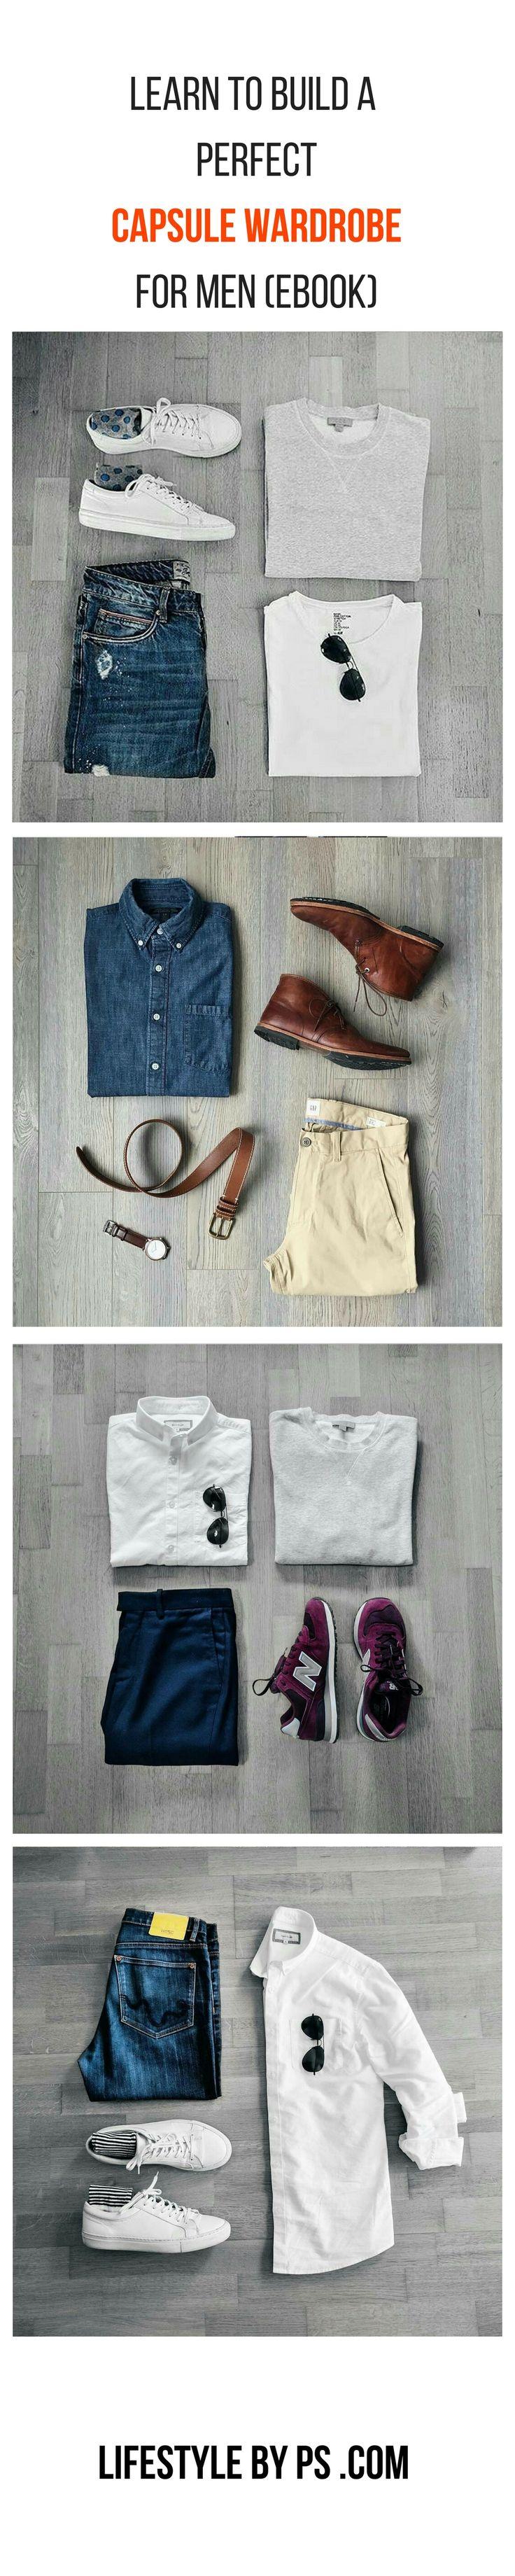 Capsule Wardrobe For men eBook. #mens #fashion #capsule #wardrobe